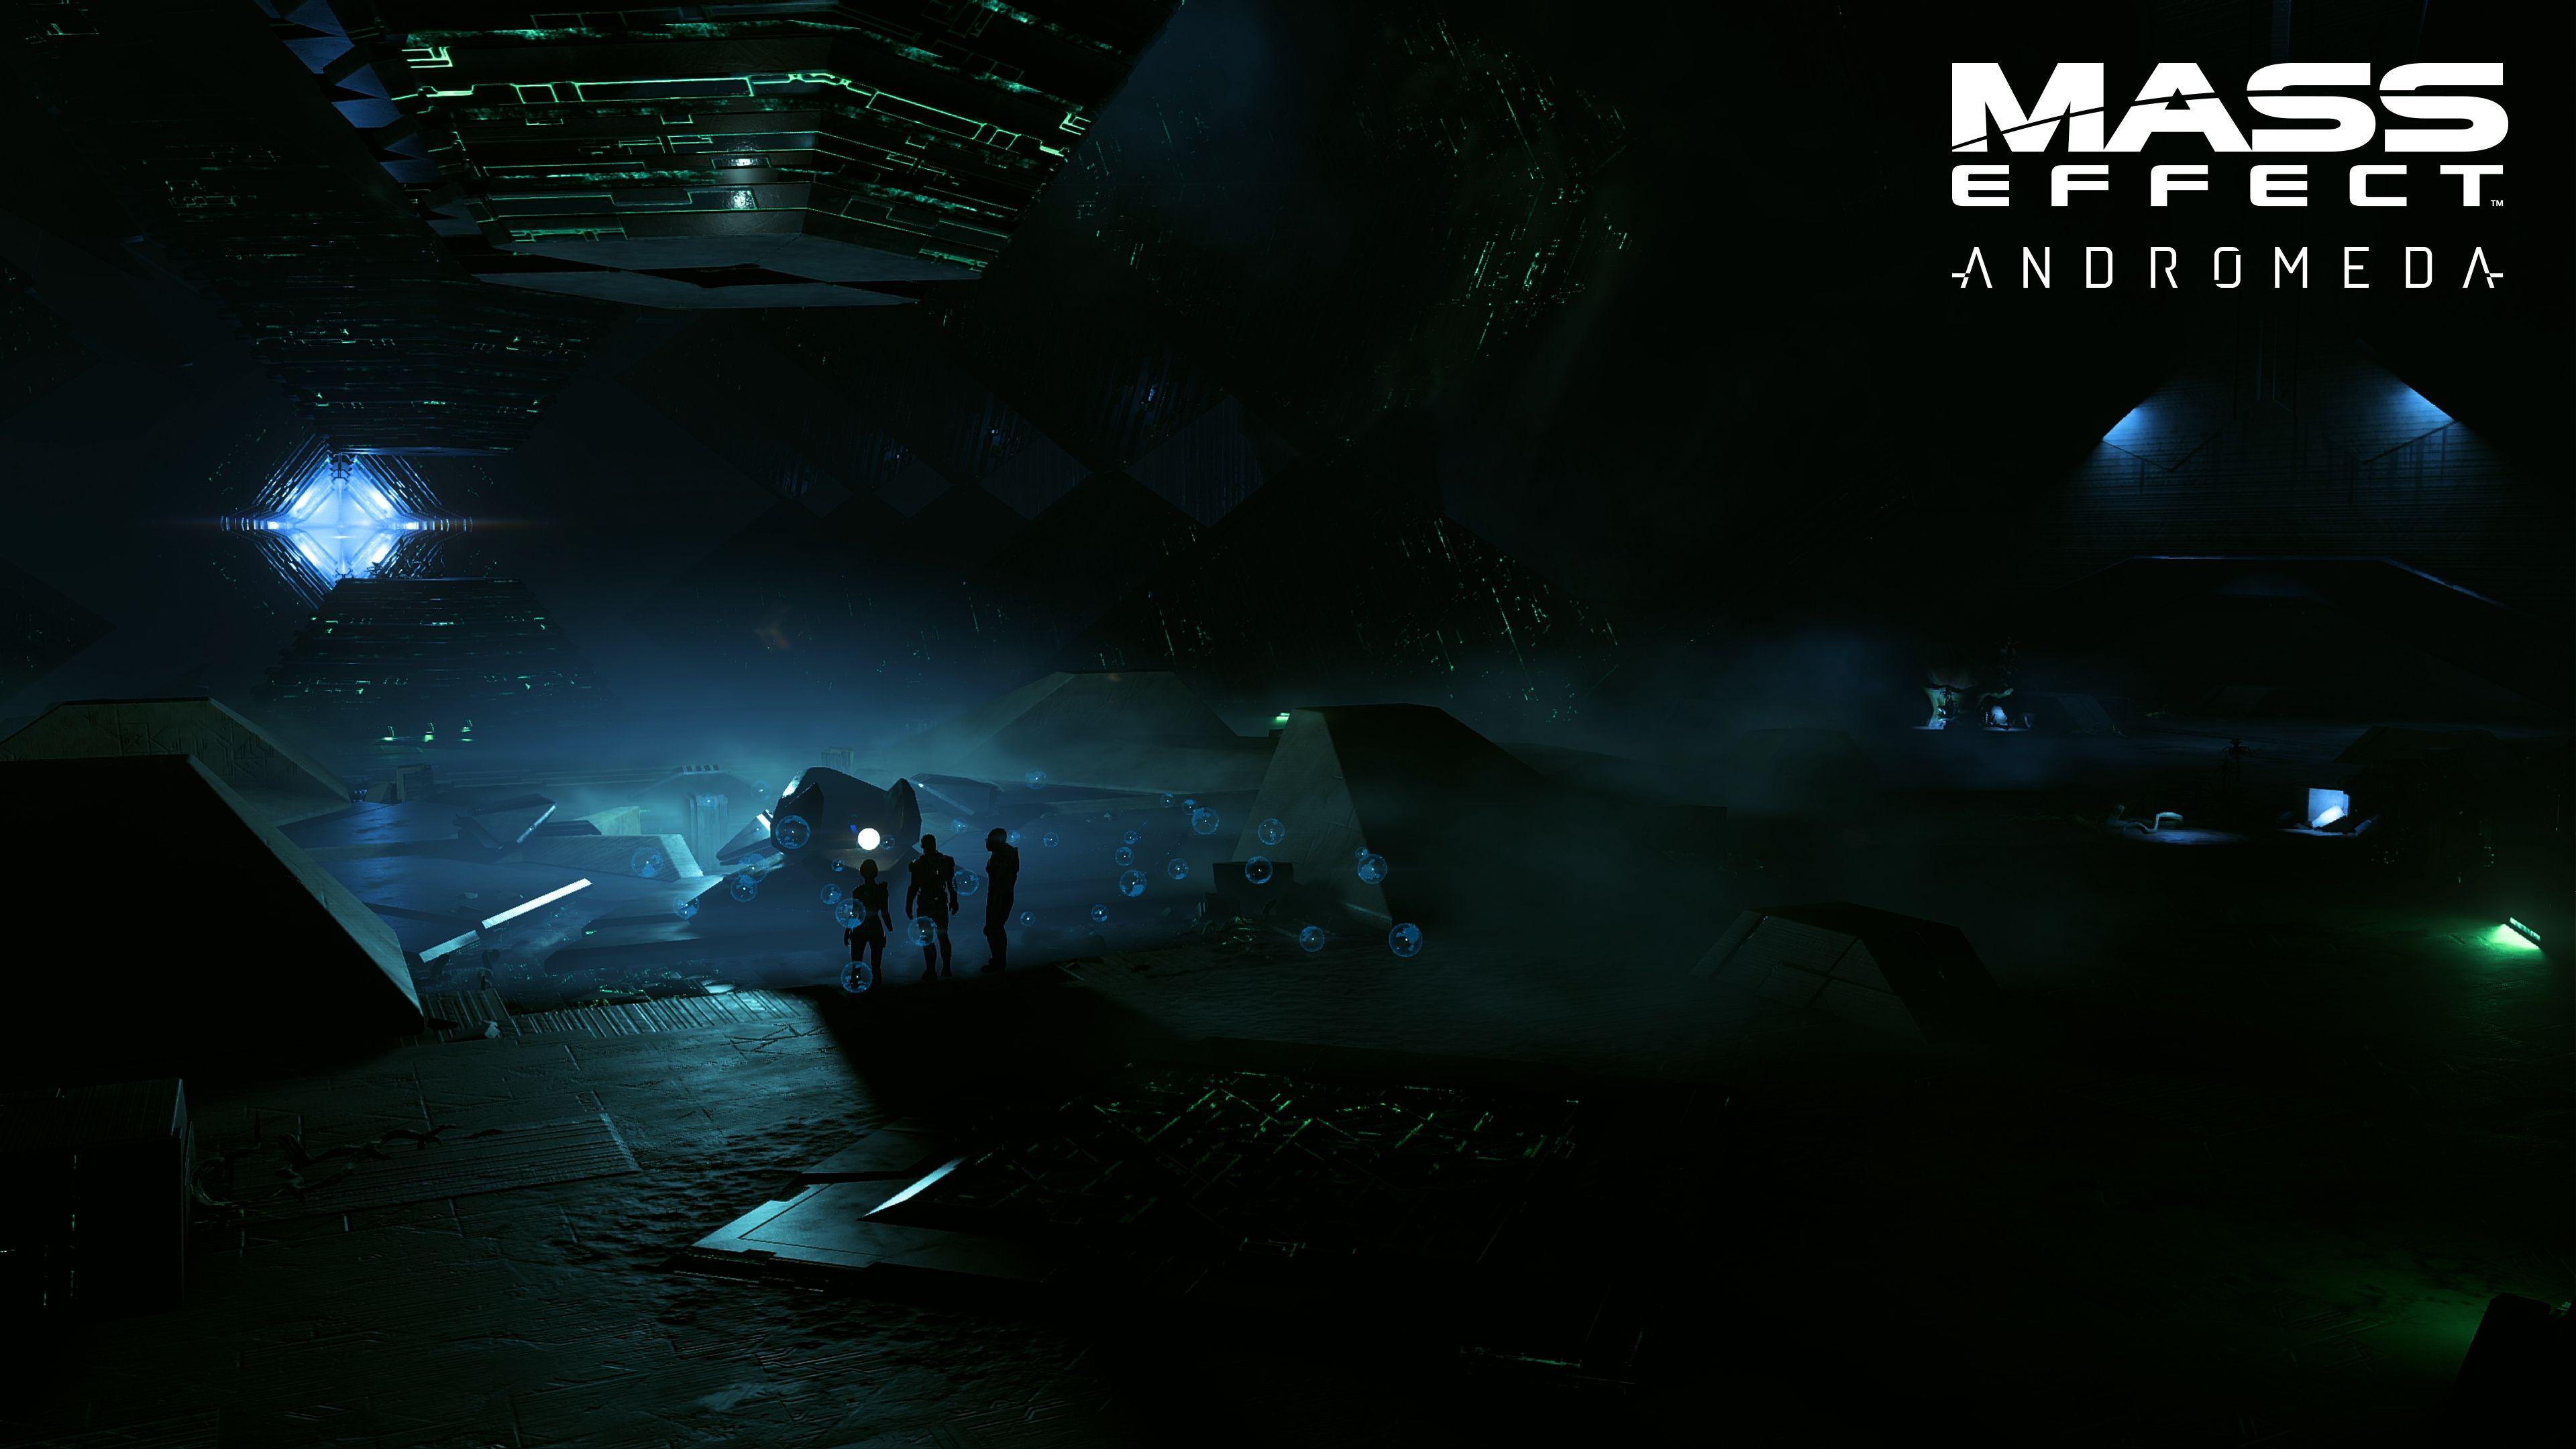 Mass Effect Andromeda (PC) - 6